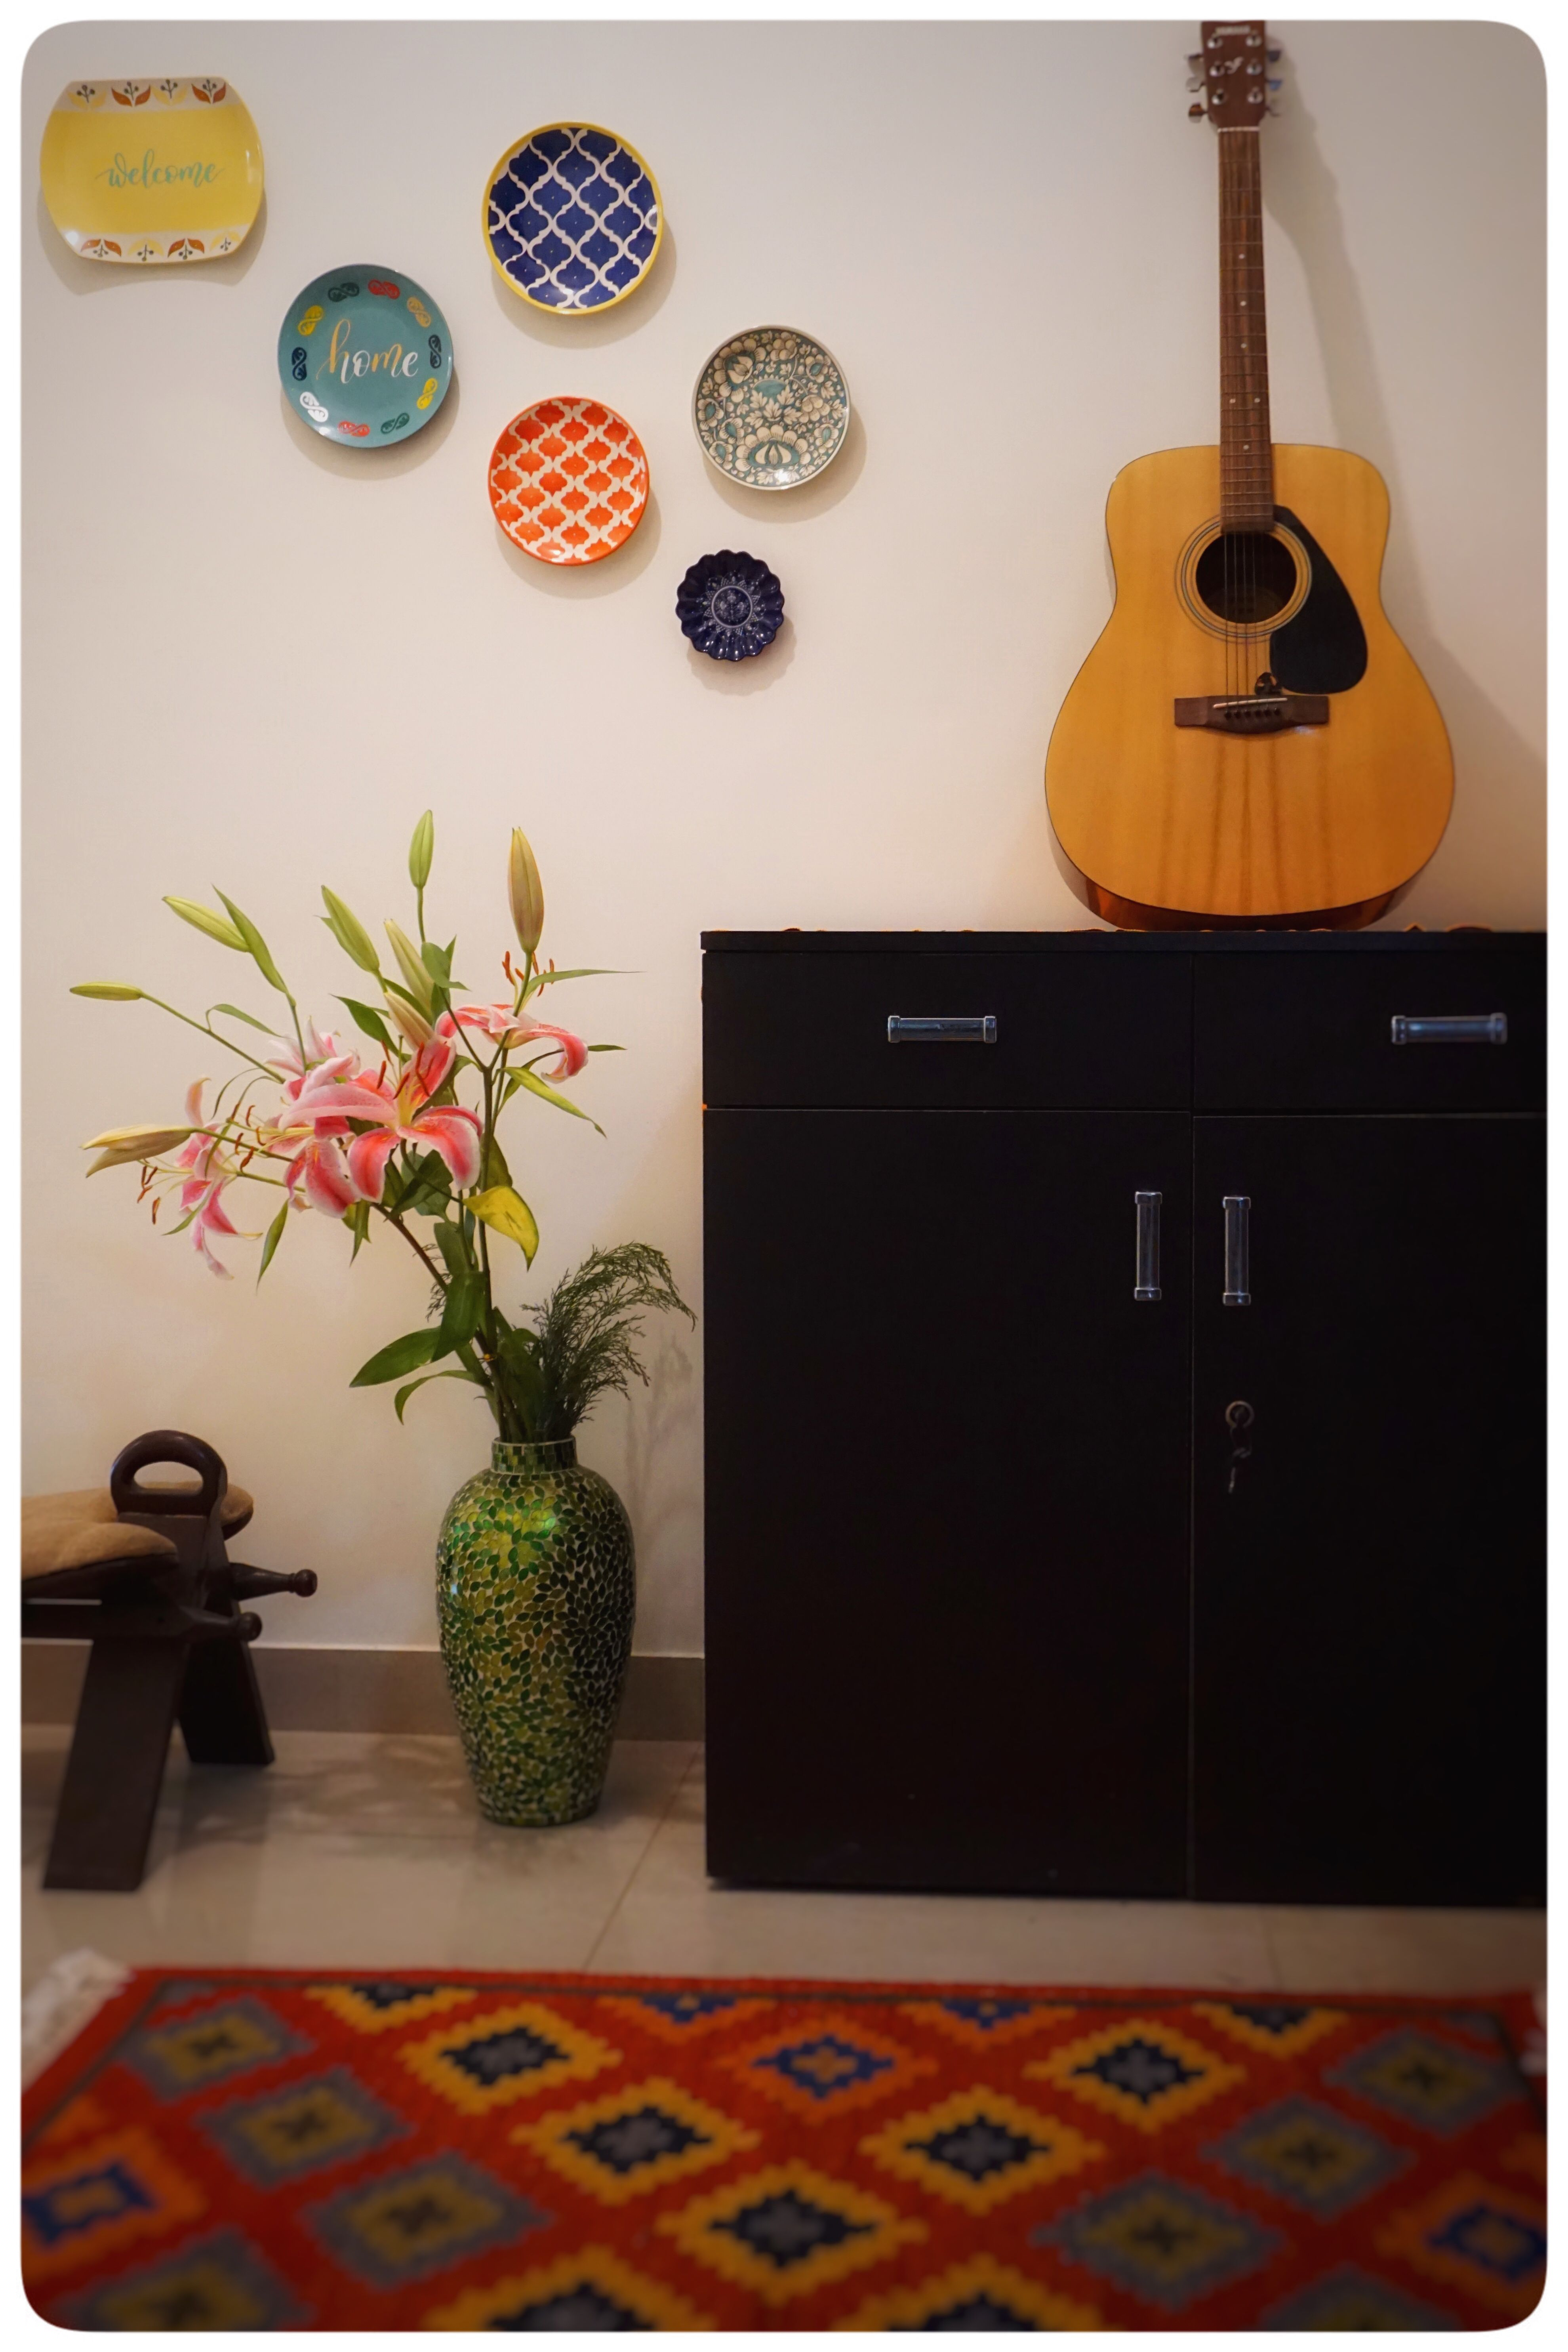 Wall Plates Decor Ceramic Plate